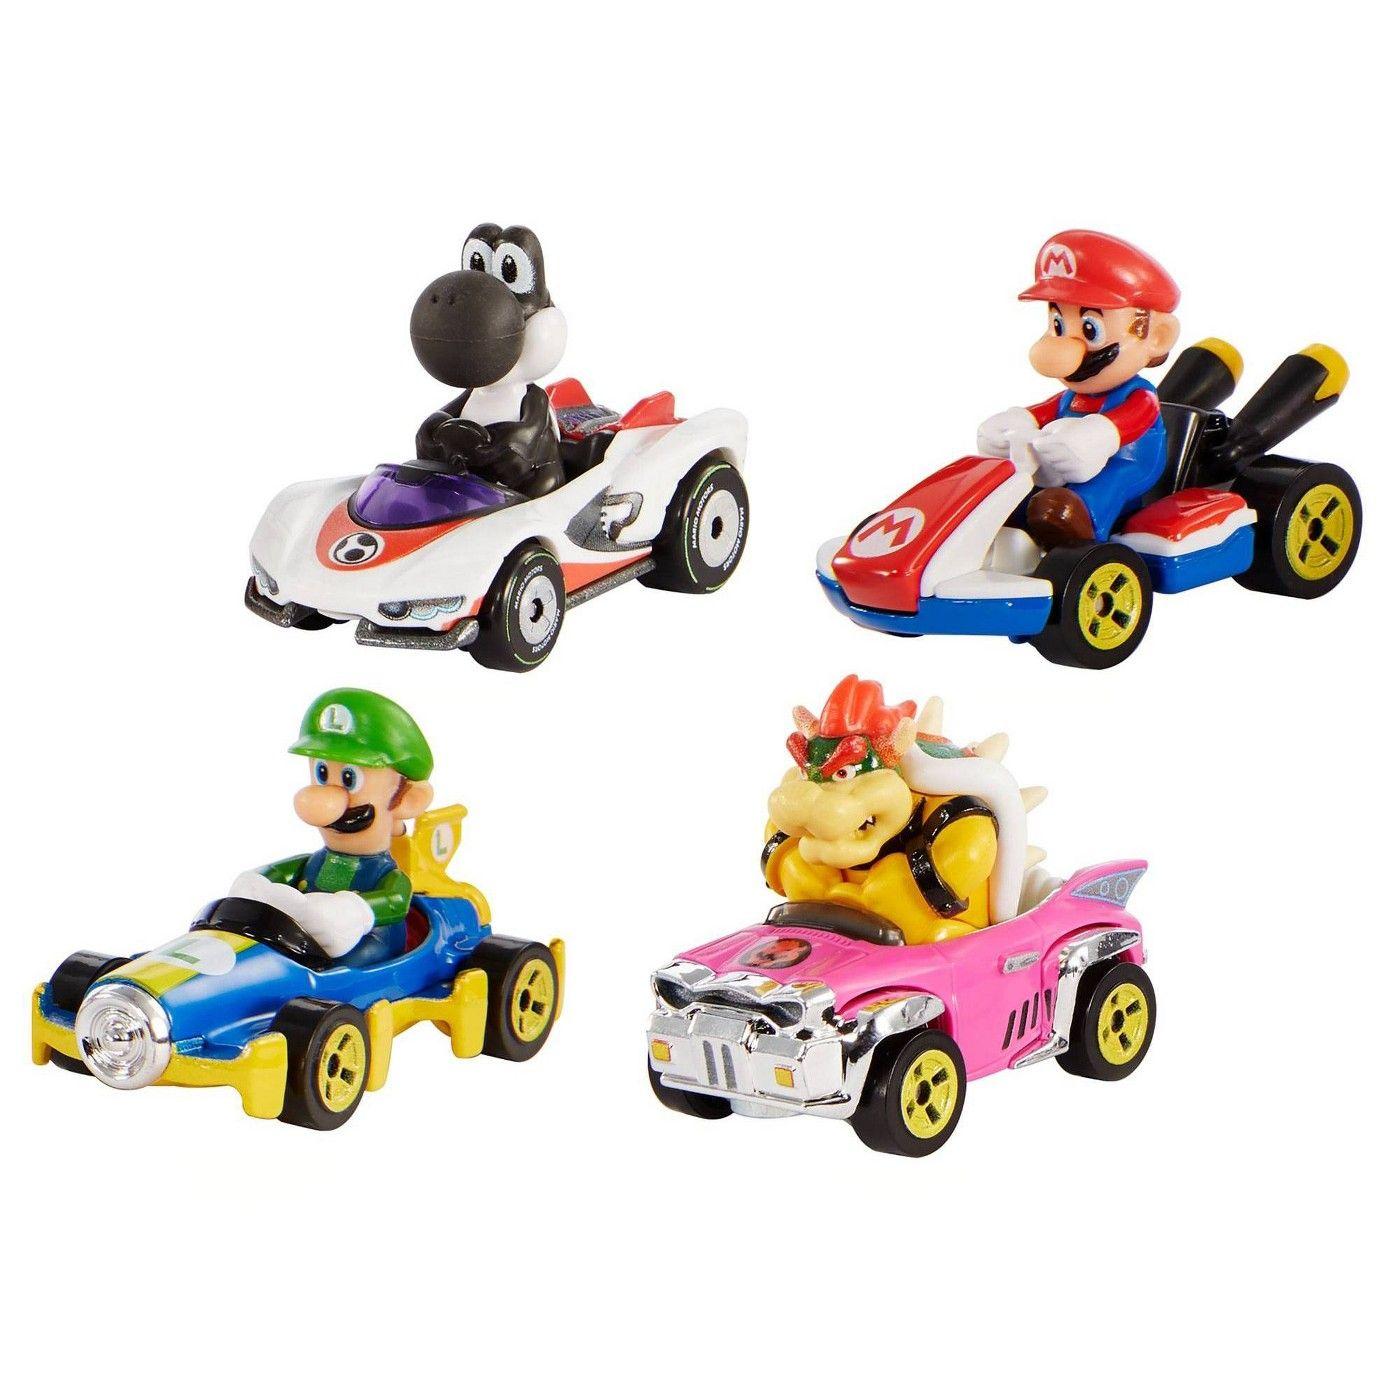 Hot Wheels Mario Kart Diecast 4 Car Pack In 2020 Hot Wheels Mattel Hot Wheels Mario Kart